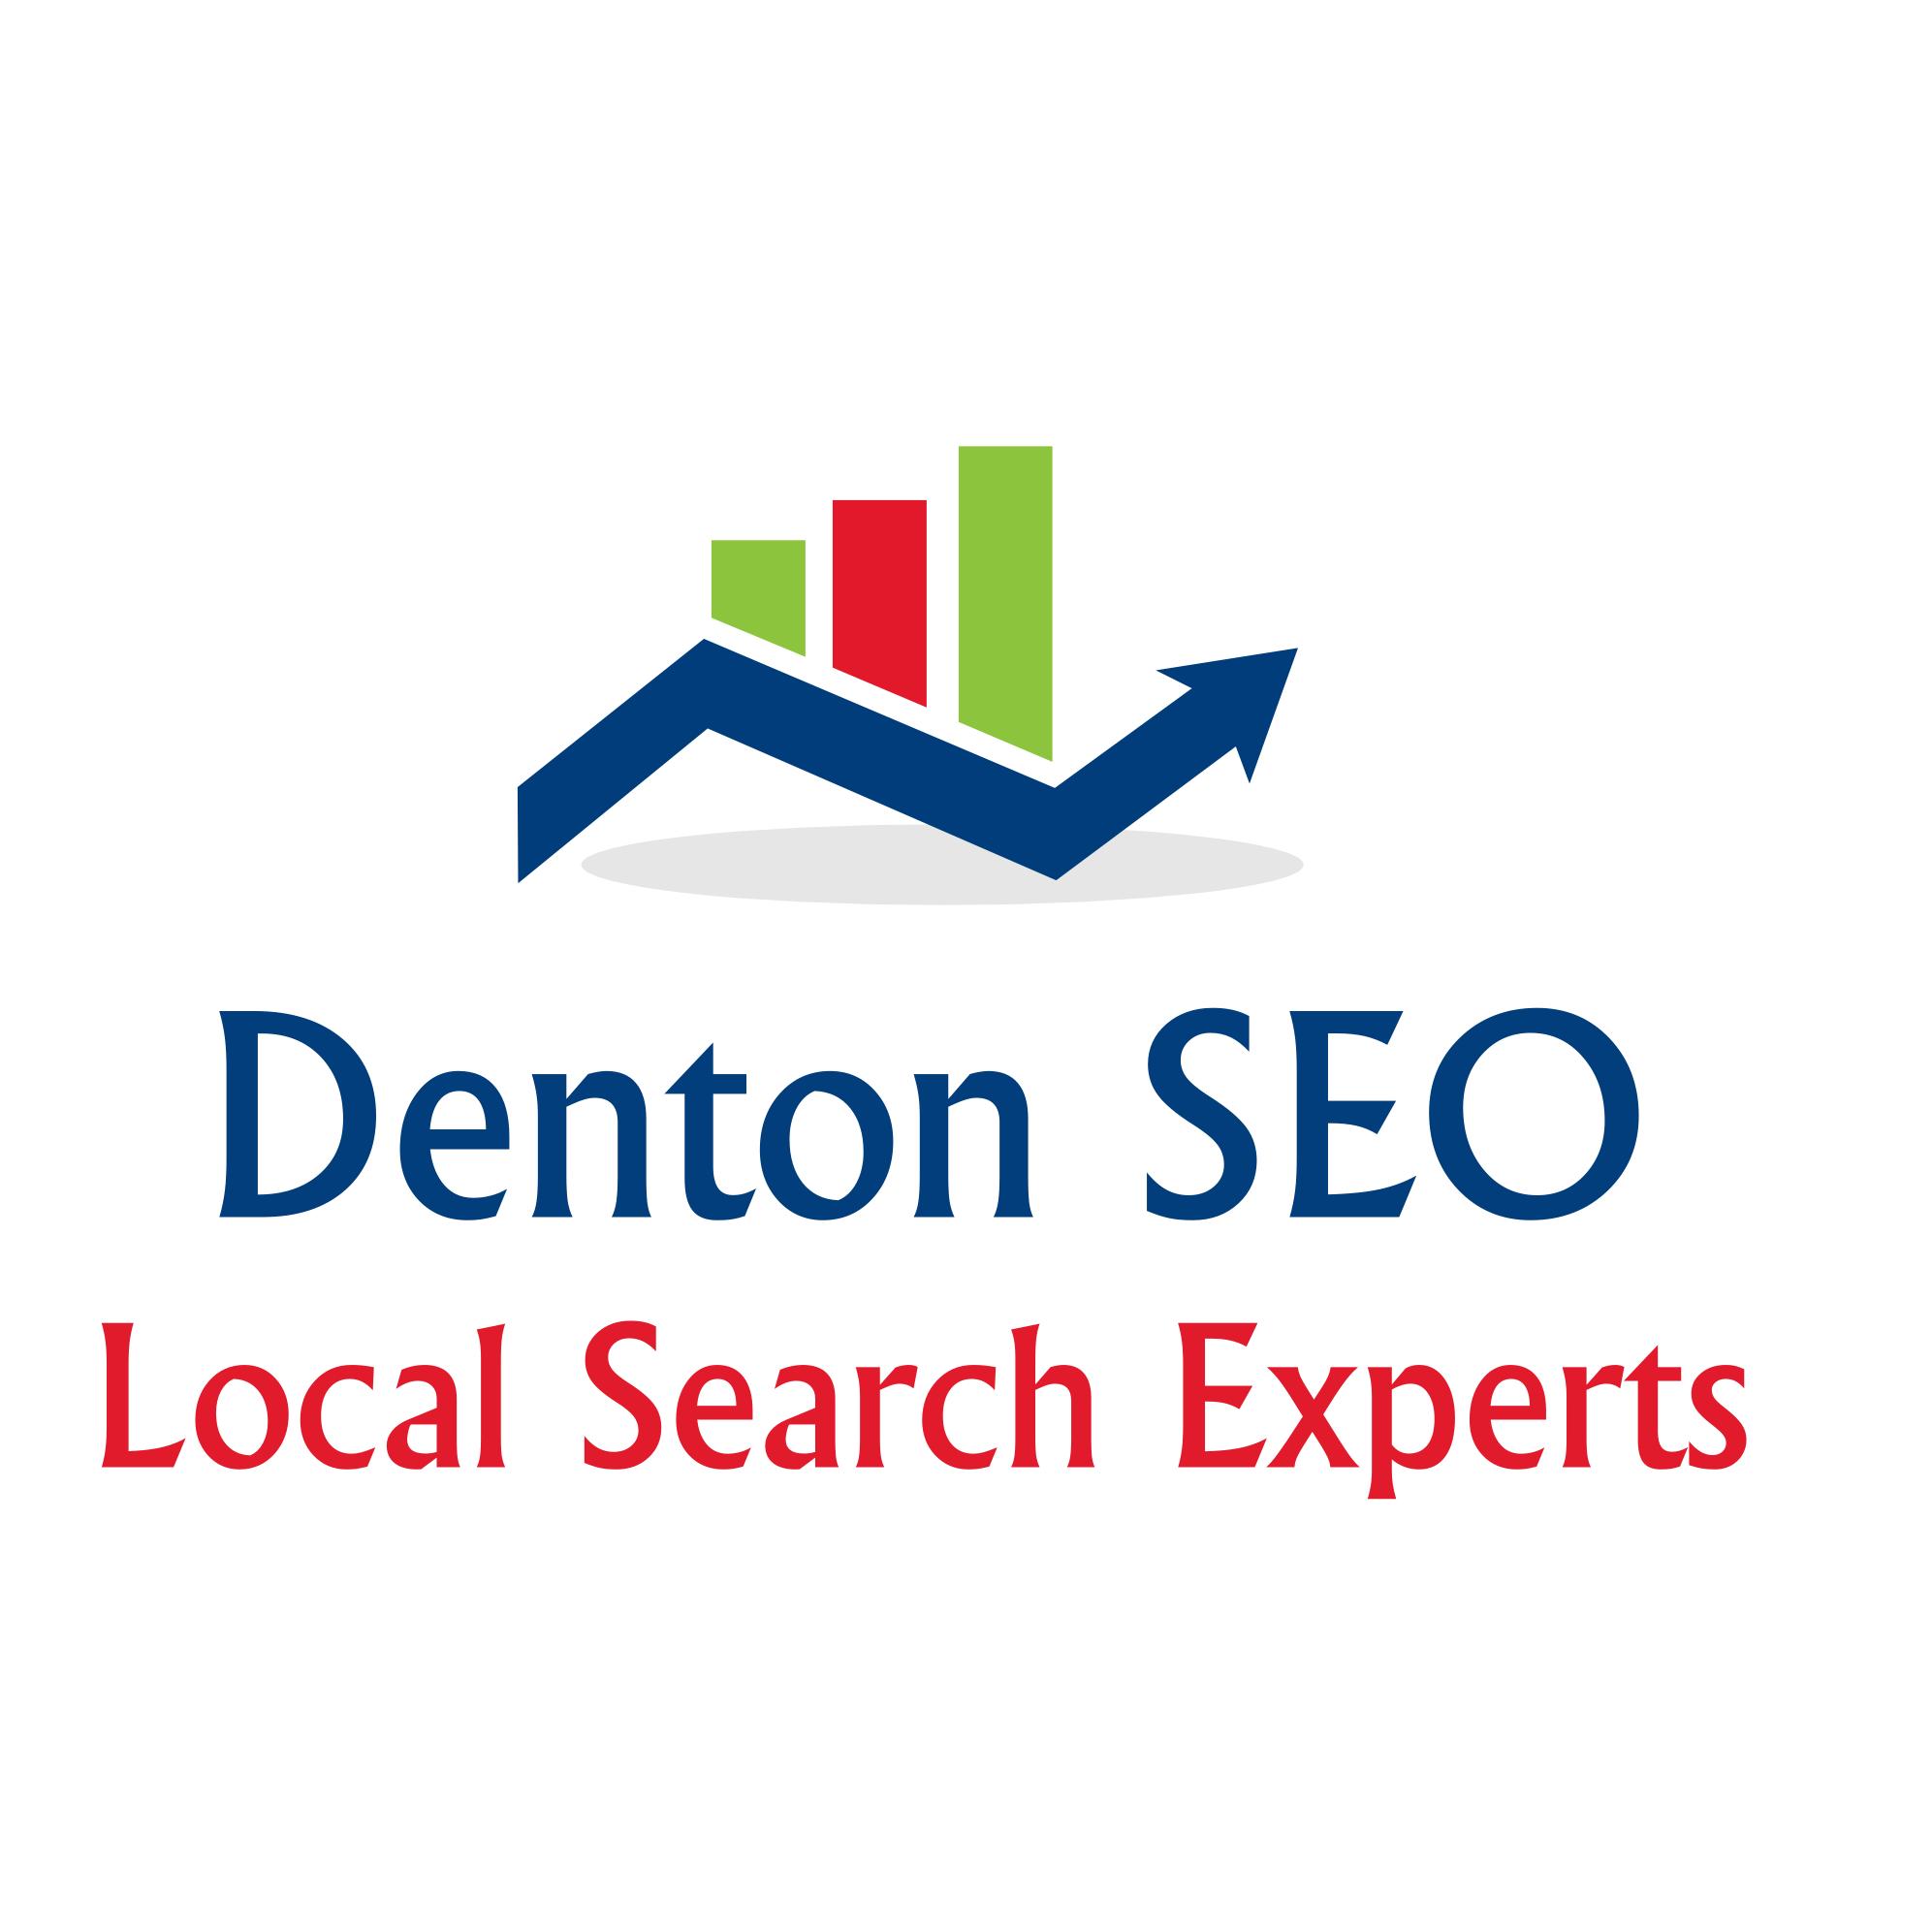 Internet Marketing Service in TX Denton 76205 Denton Local SEO 1904 Wisteria St  (940)765-4241